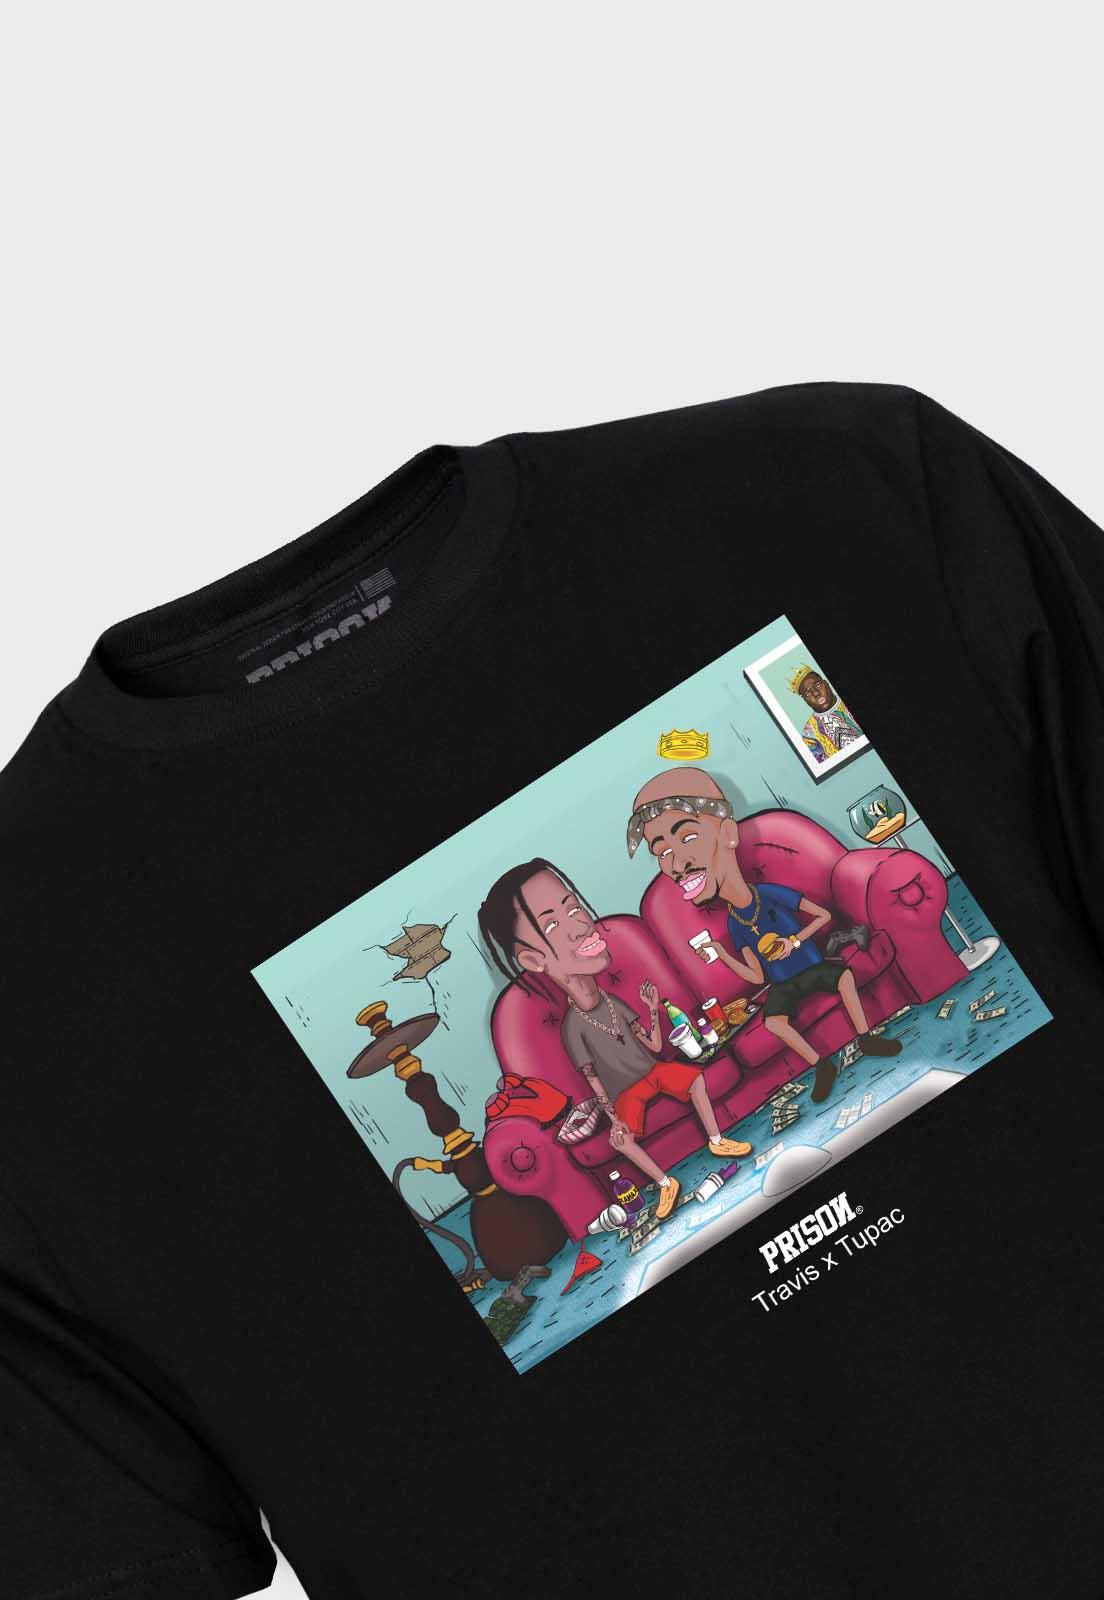 Camiseta Prison Travis x Tupac